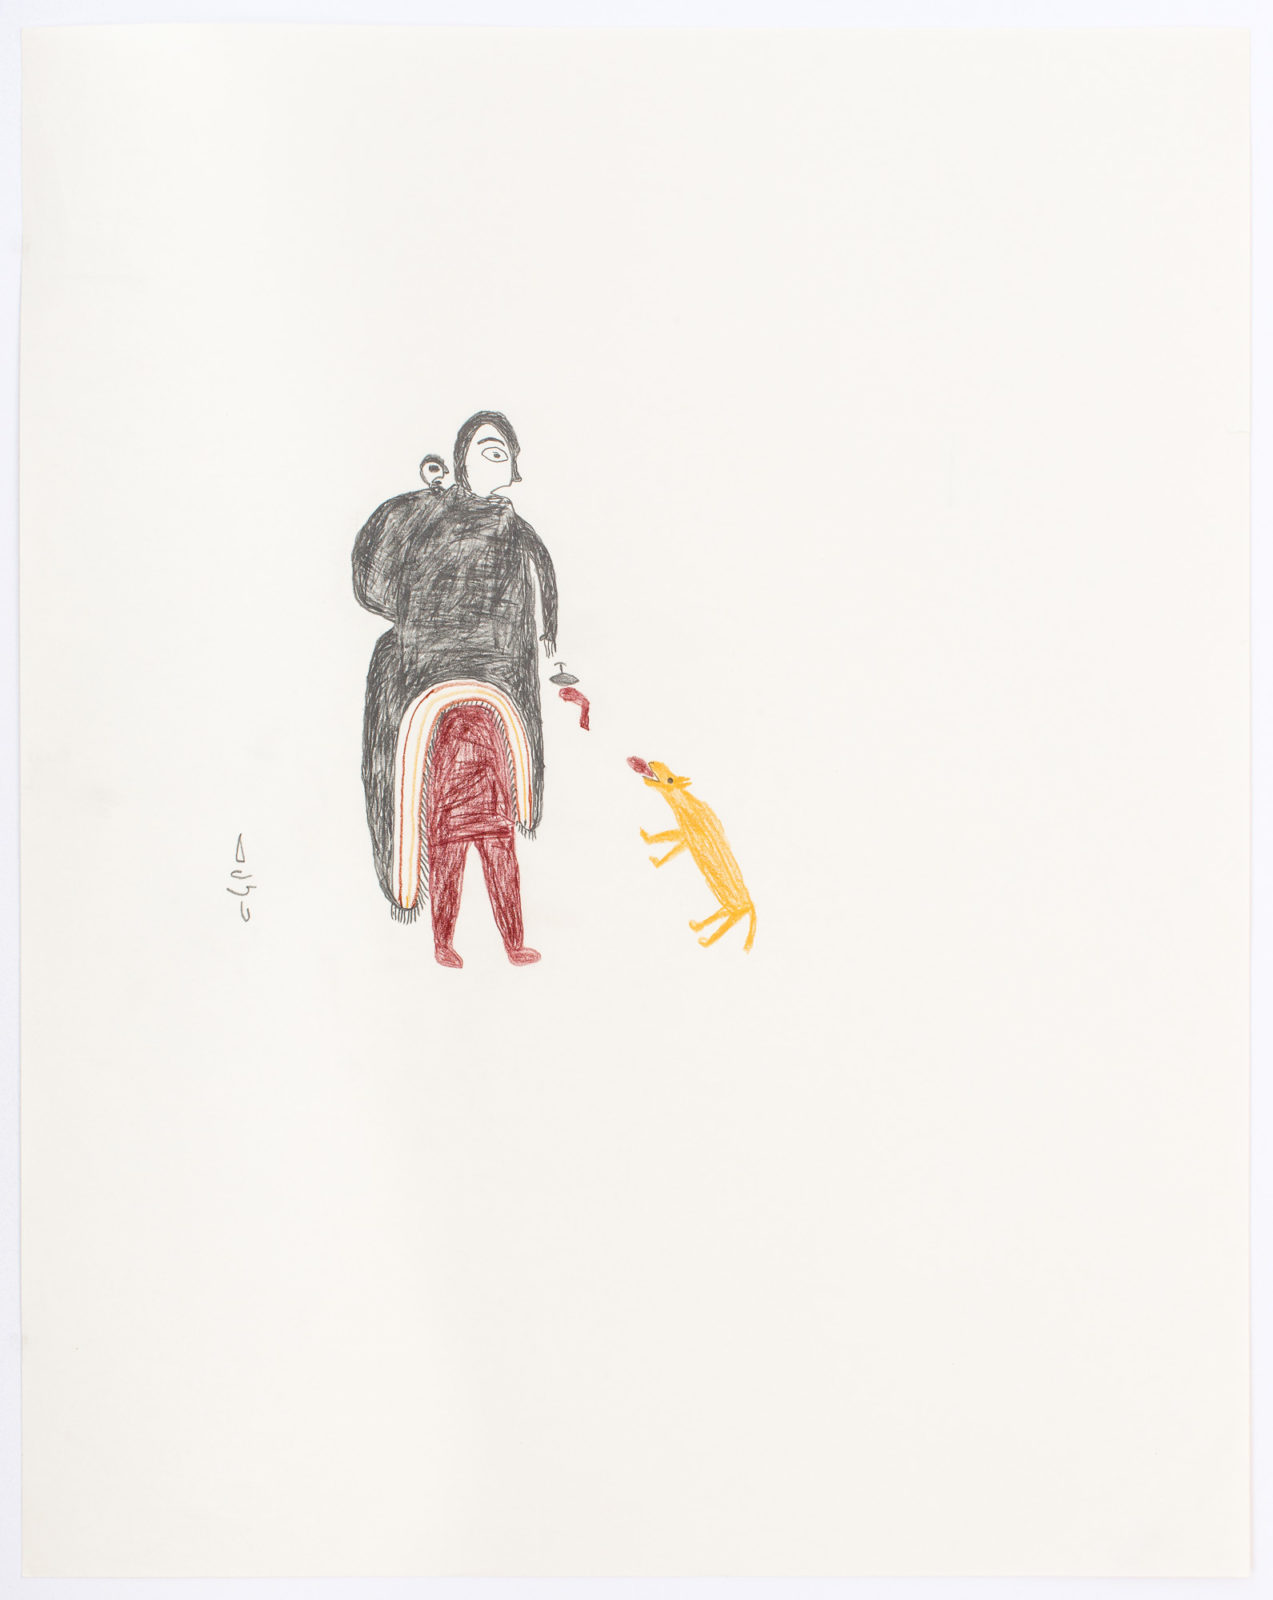 Luke Anguhadluq - untitled (woman feeding dog)